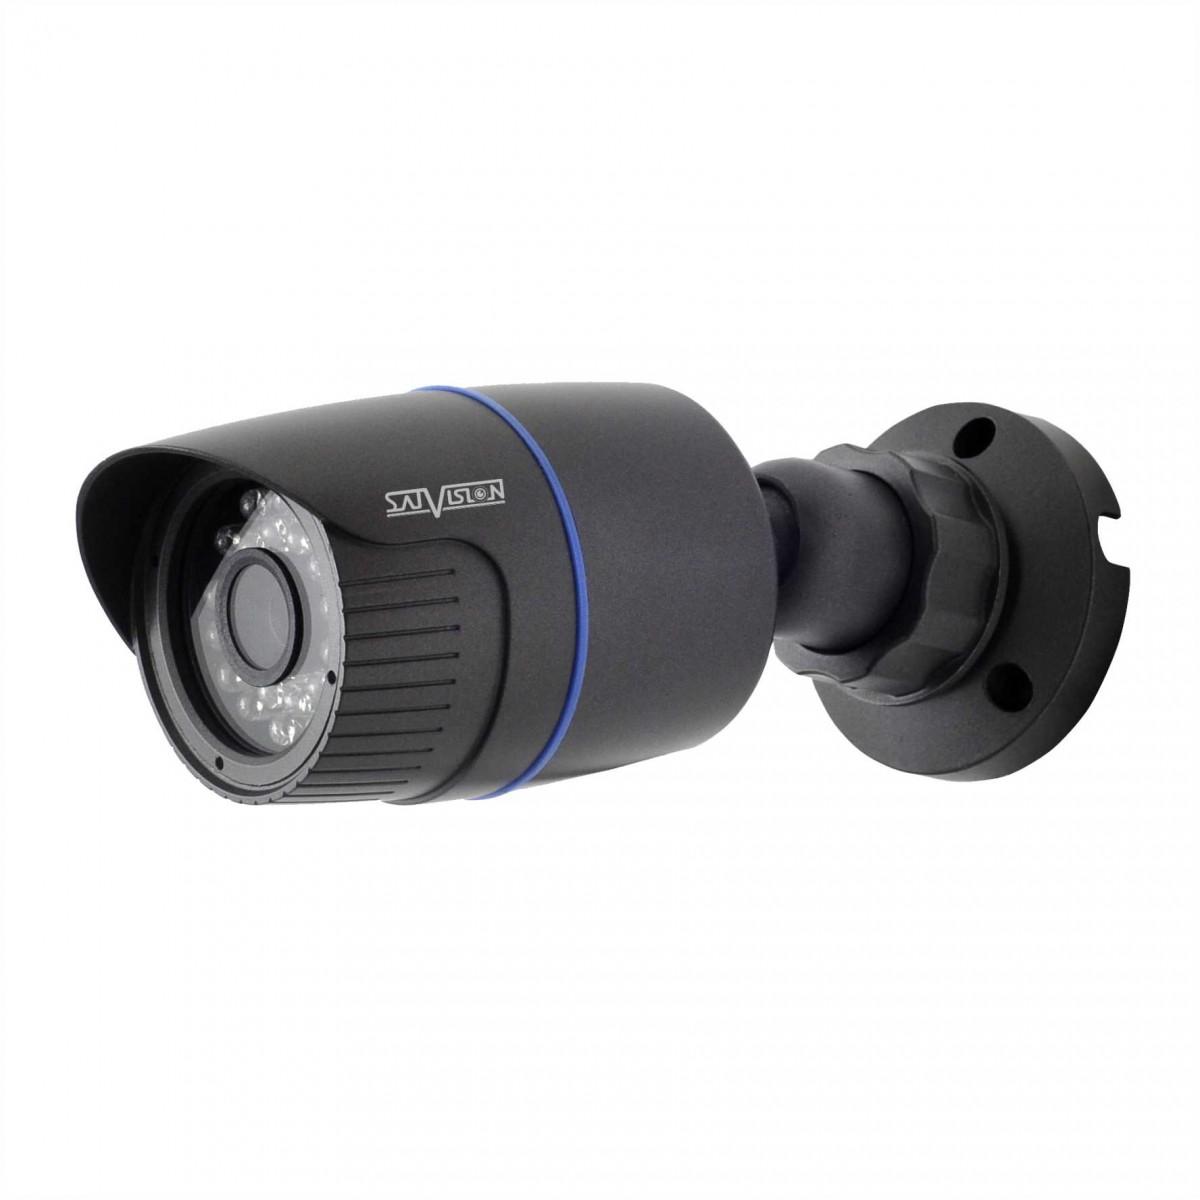 Уличная видеокамера Satvision SVC-S192 v3.0 2Мп 3.6мм UTC